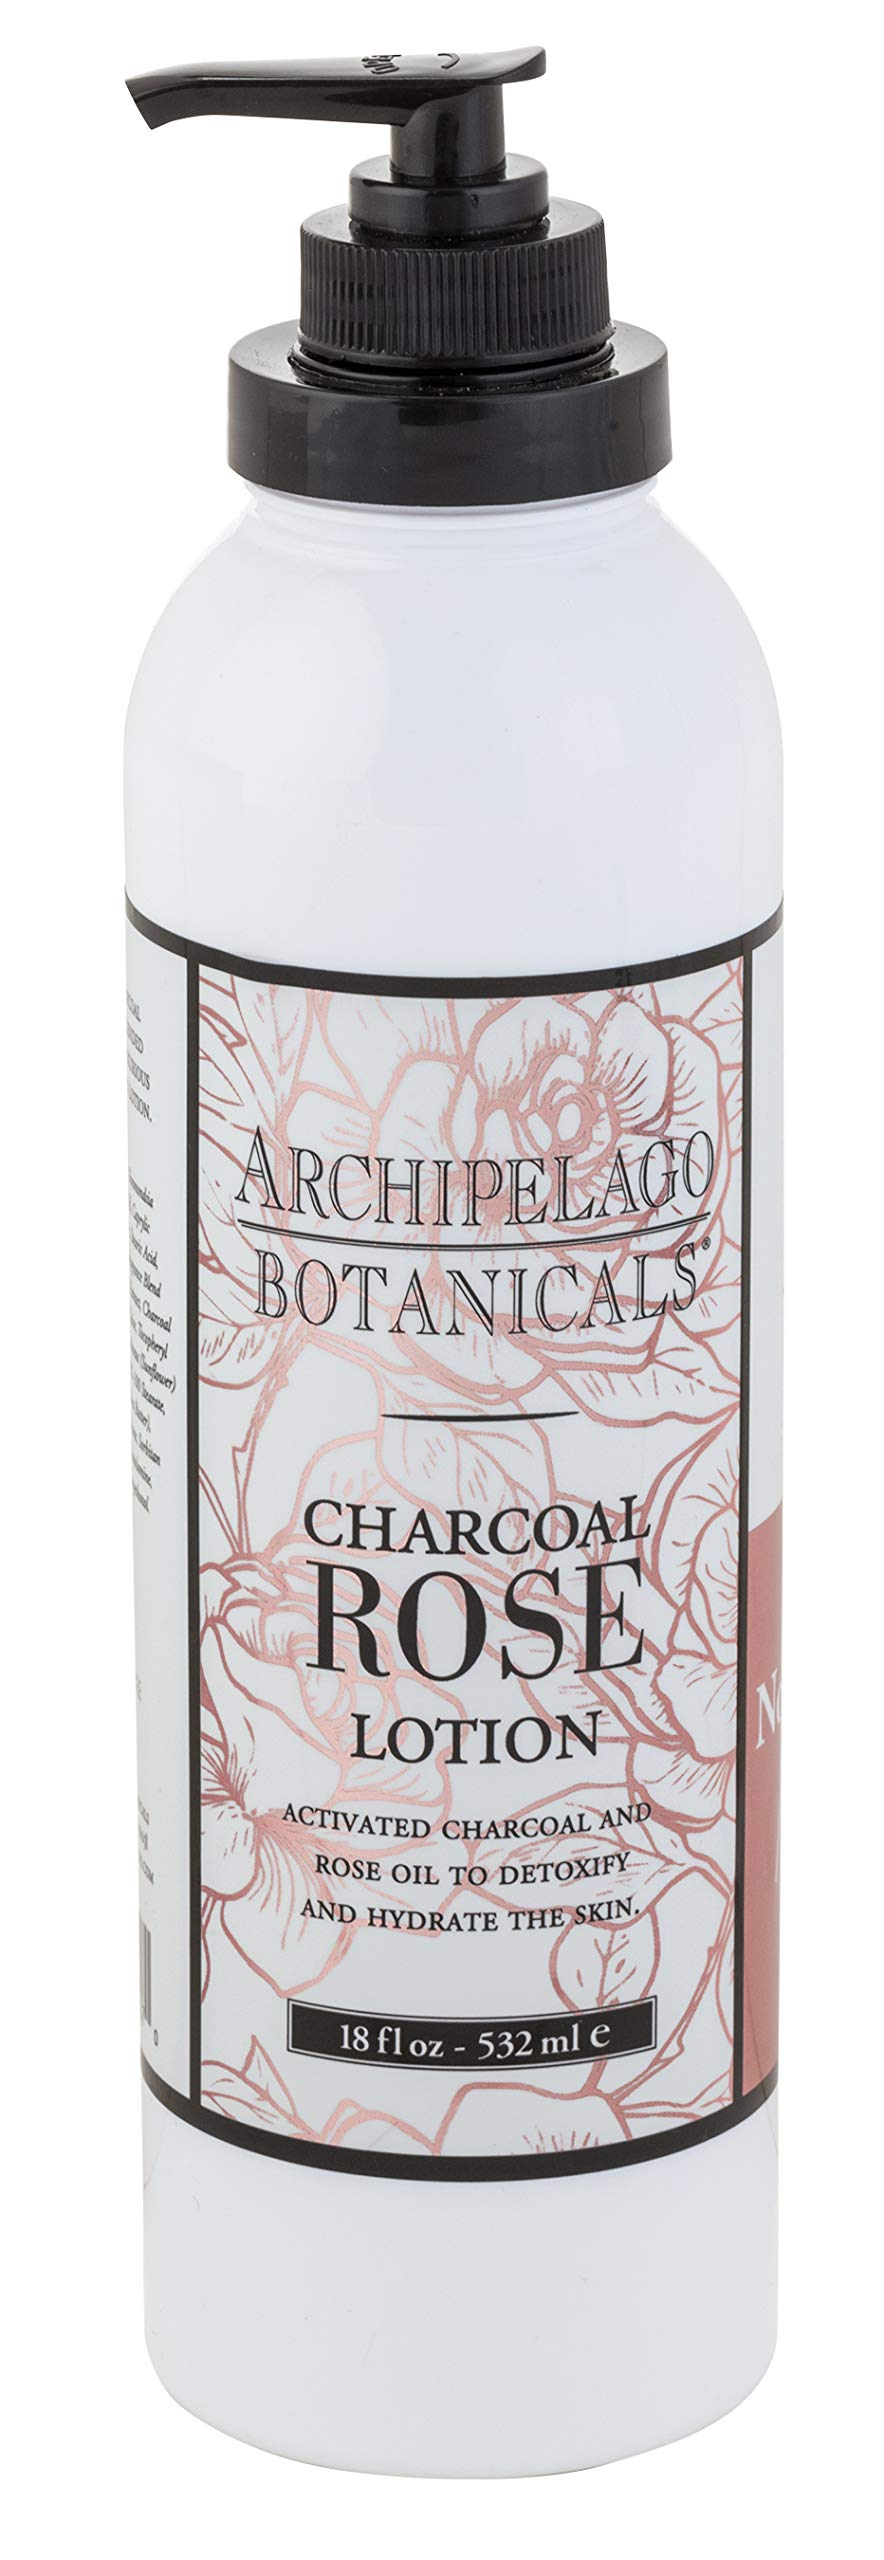 Archipelago Charcoal Rose Lotion, 18 Fl Oz by Archipelago Botanicals